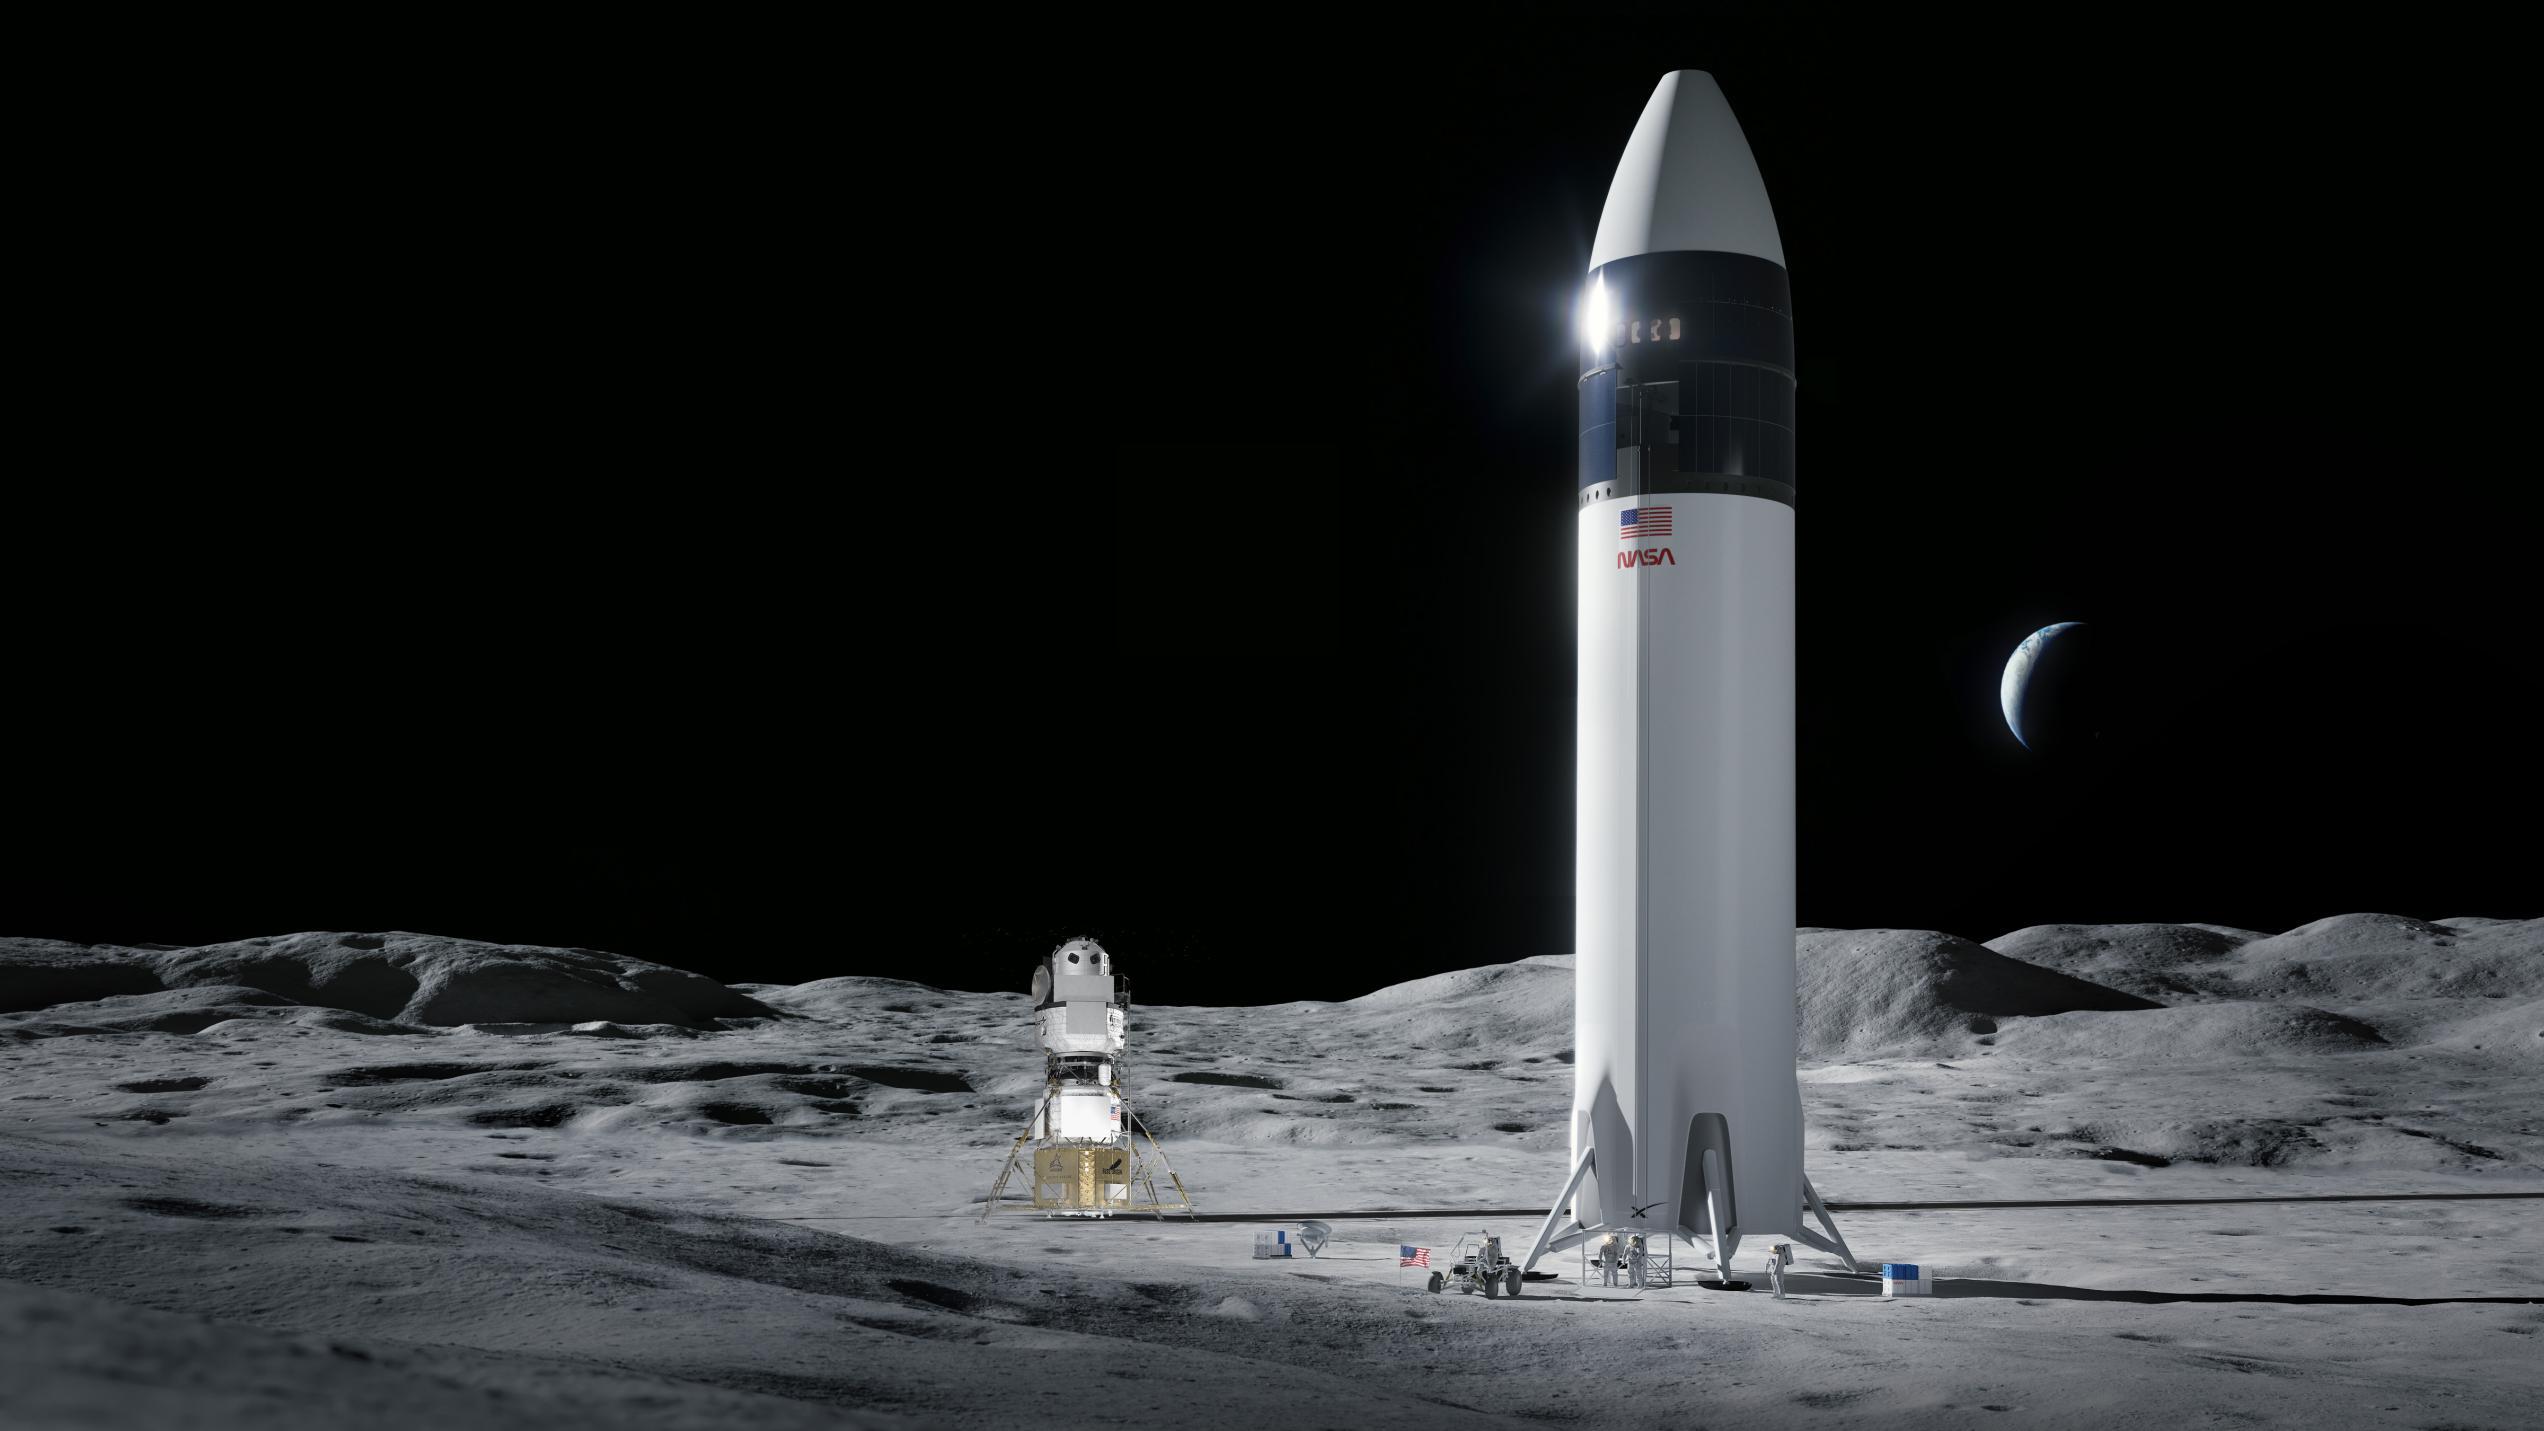 Lunar Starship Artemis (SpaceX) 2021 vs National Team lander 1 (c)